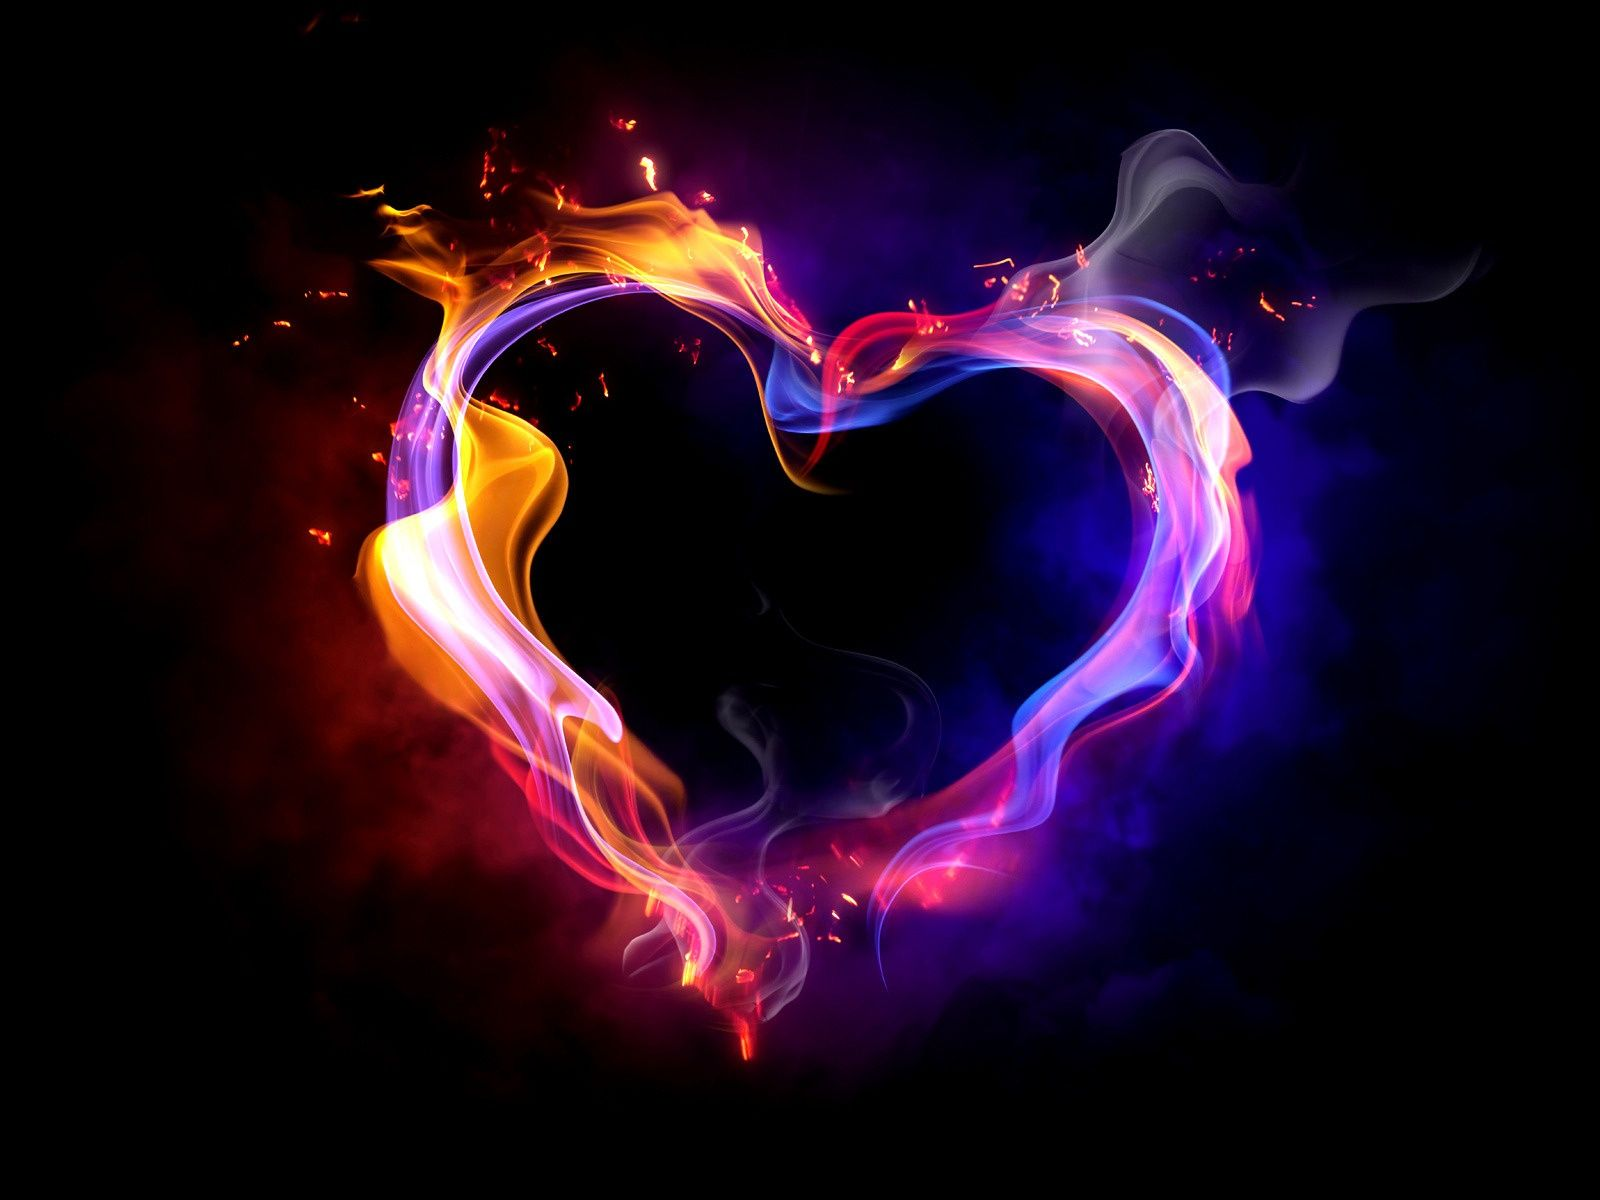 Fire Heart Fire Heart Heart Wallpaper Love Hd Wallpaper